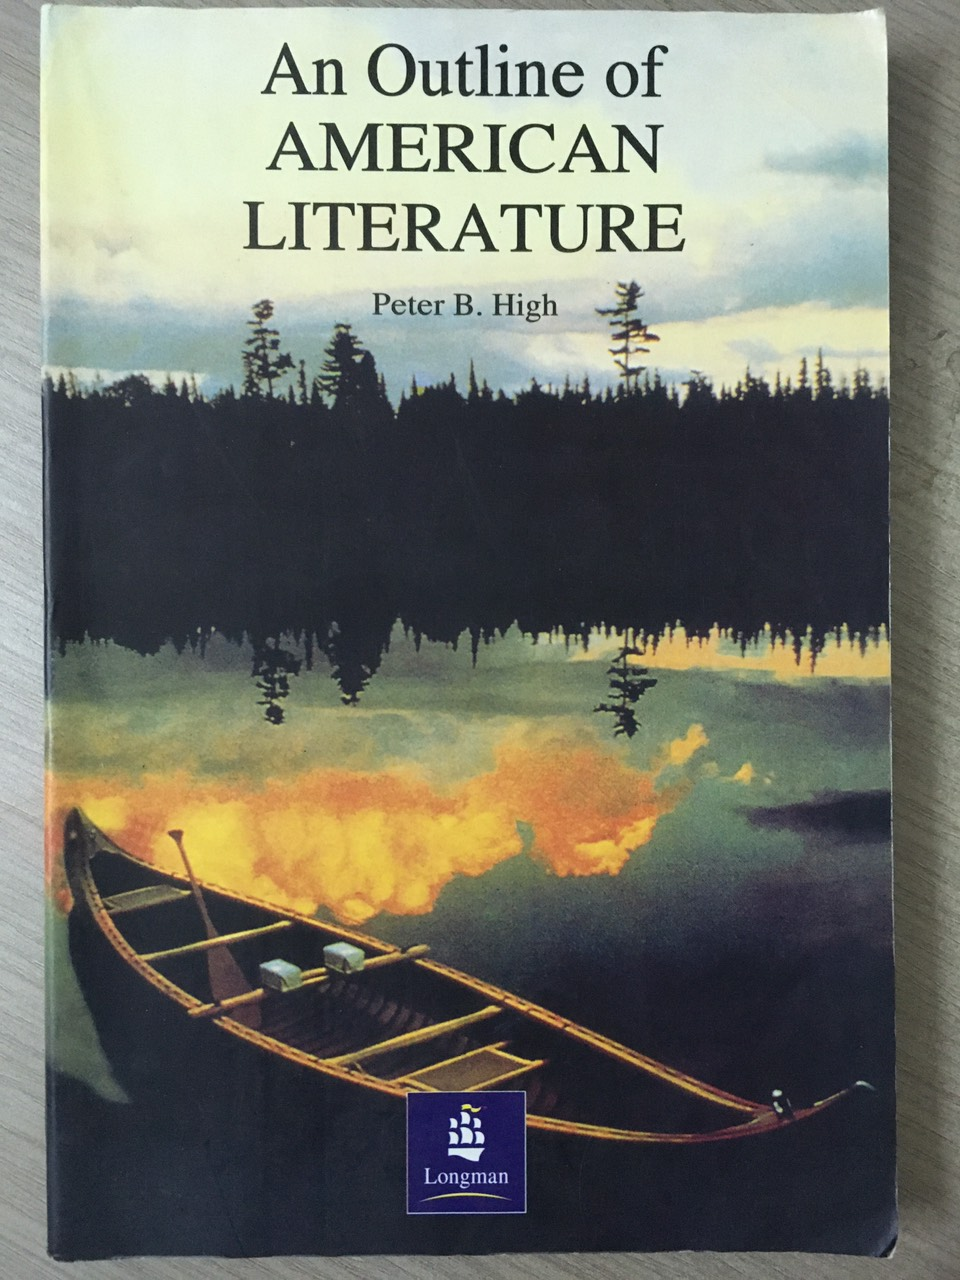 An Outline American Literature  Peter B. High  Longman